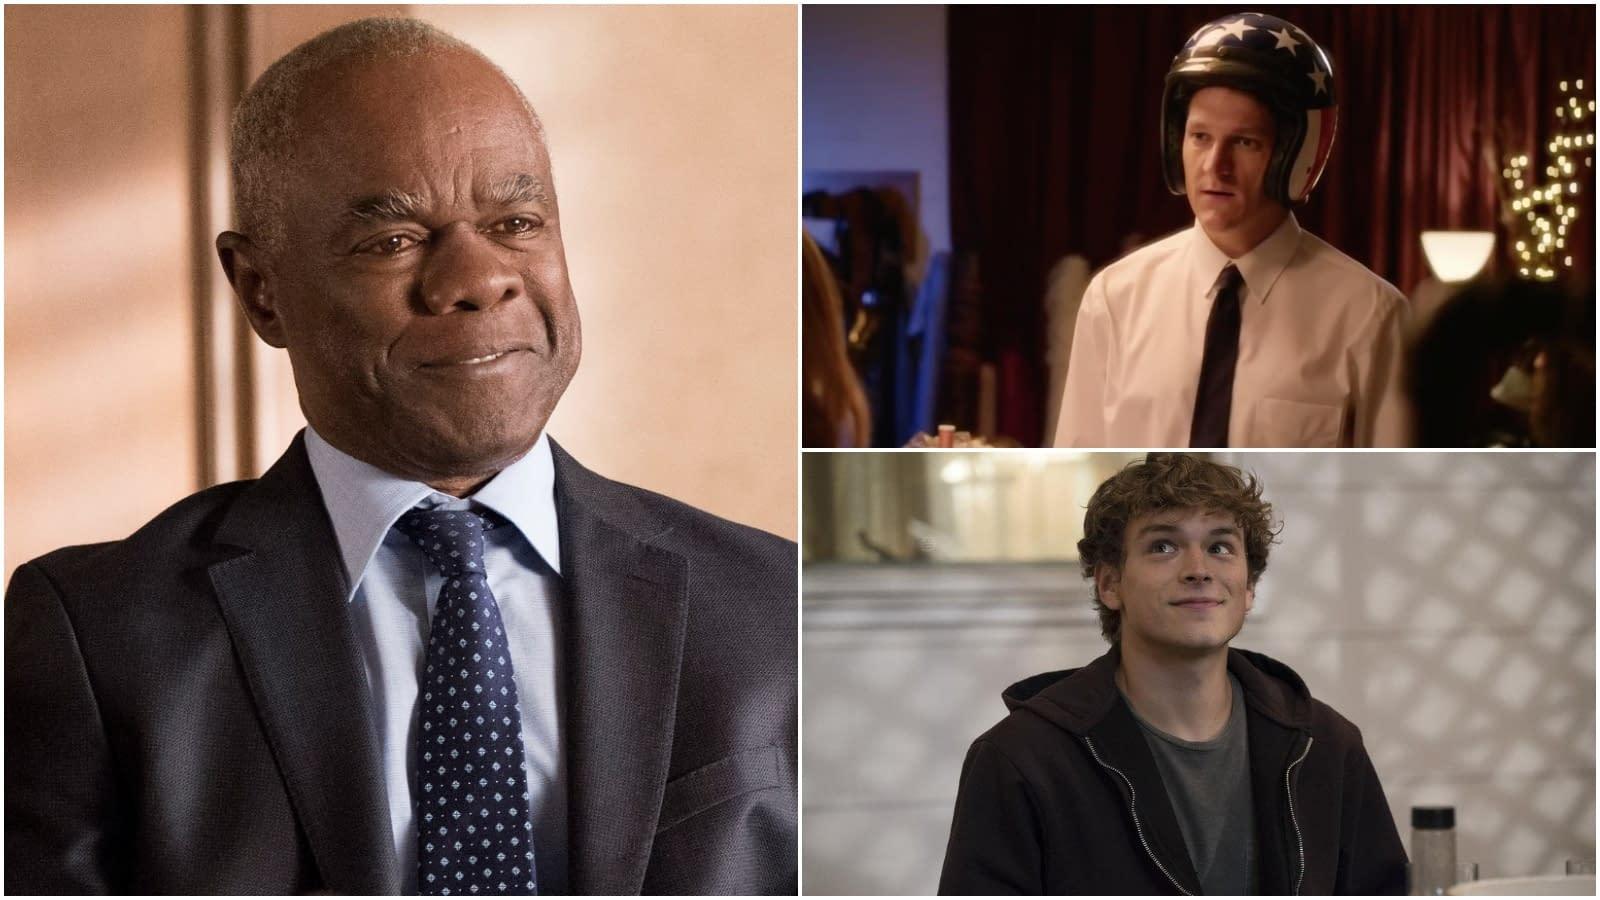 'Mr. Mercedes' Season 3 Adds Gabriel Ebert, Rarmian Newton as Regulars; Glynn Turman to Recur